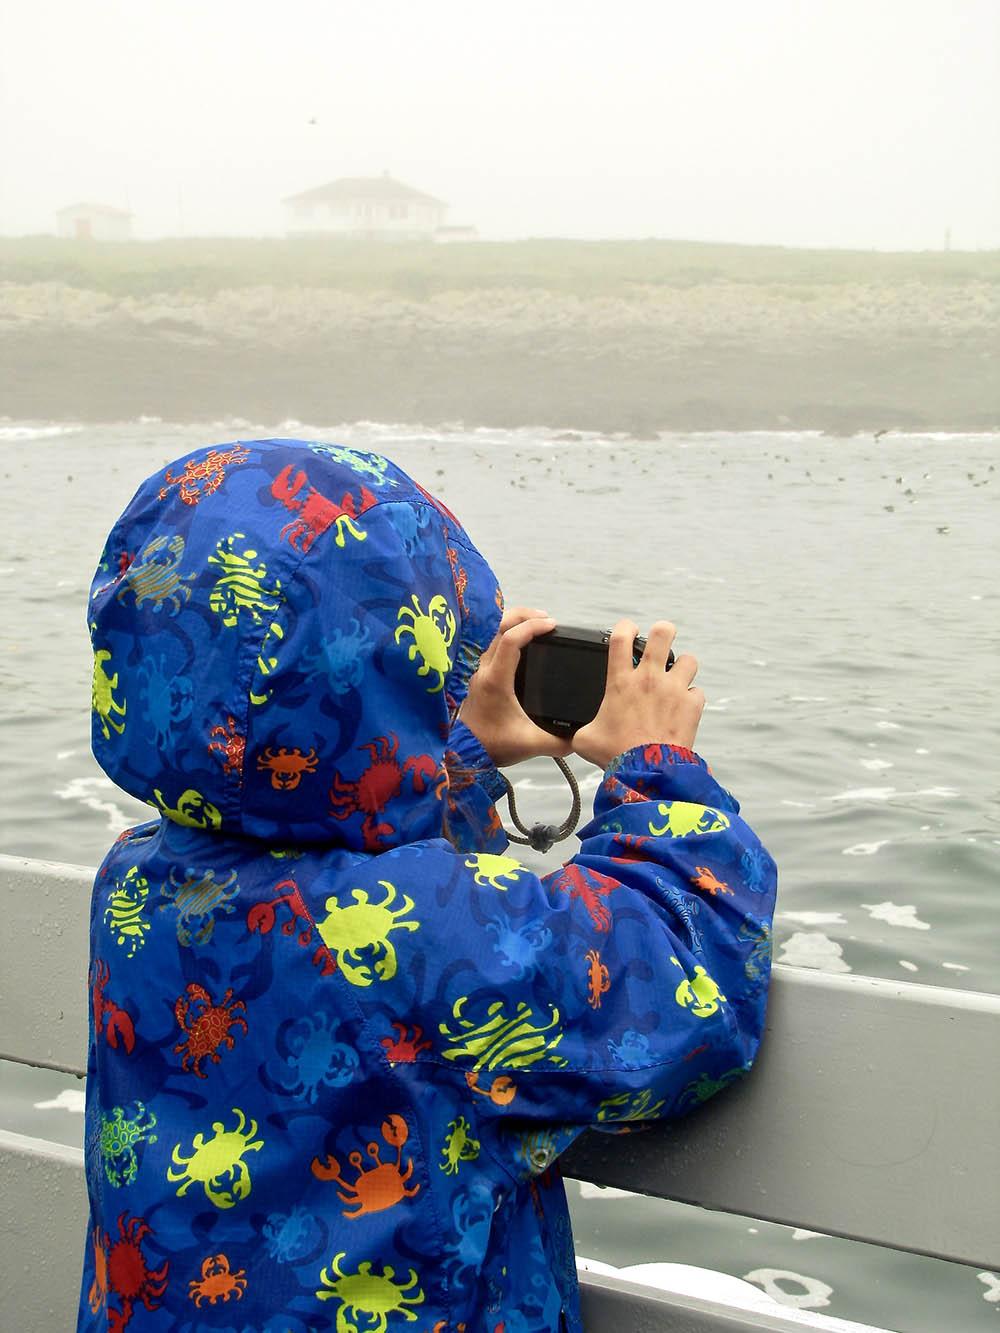 Machias-Seal-Island-Child